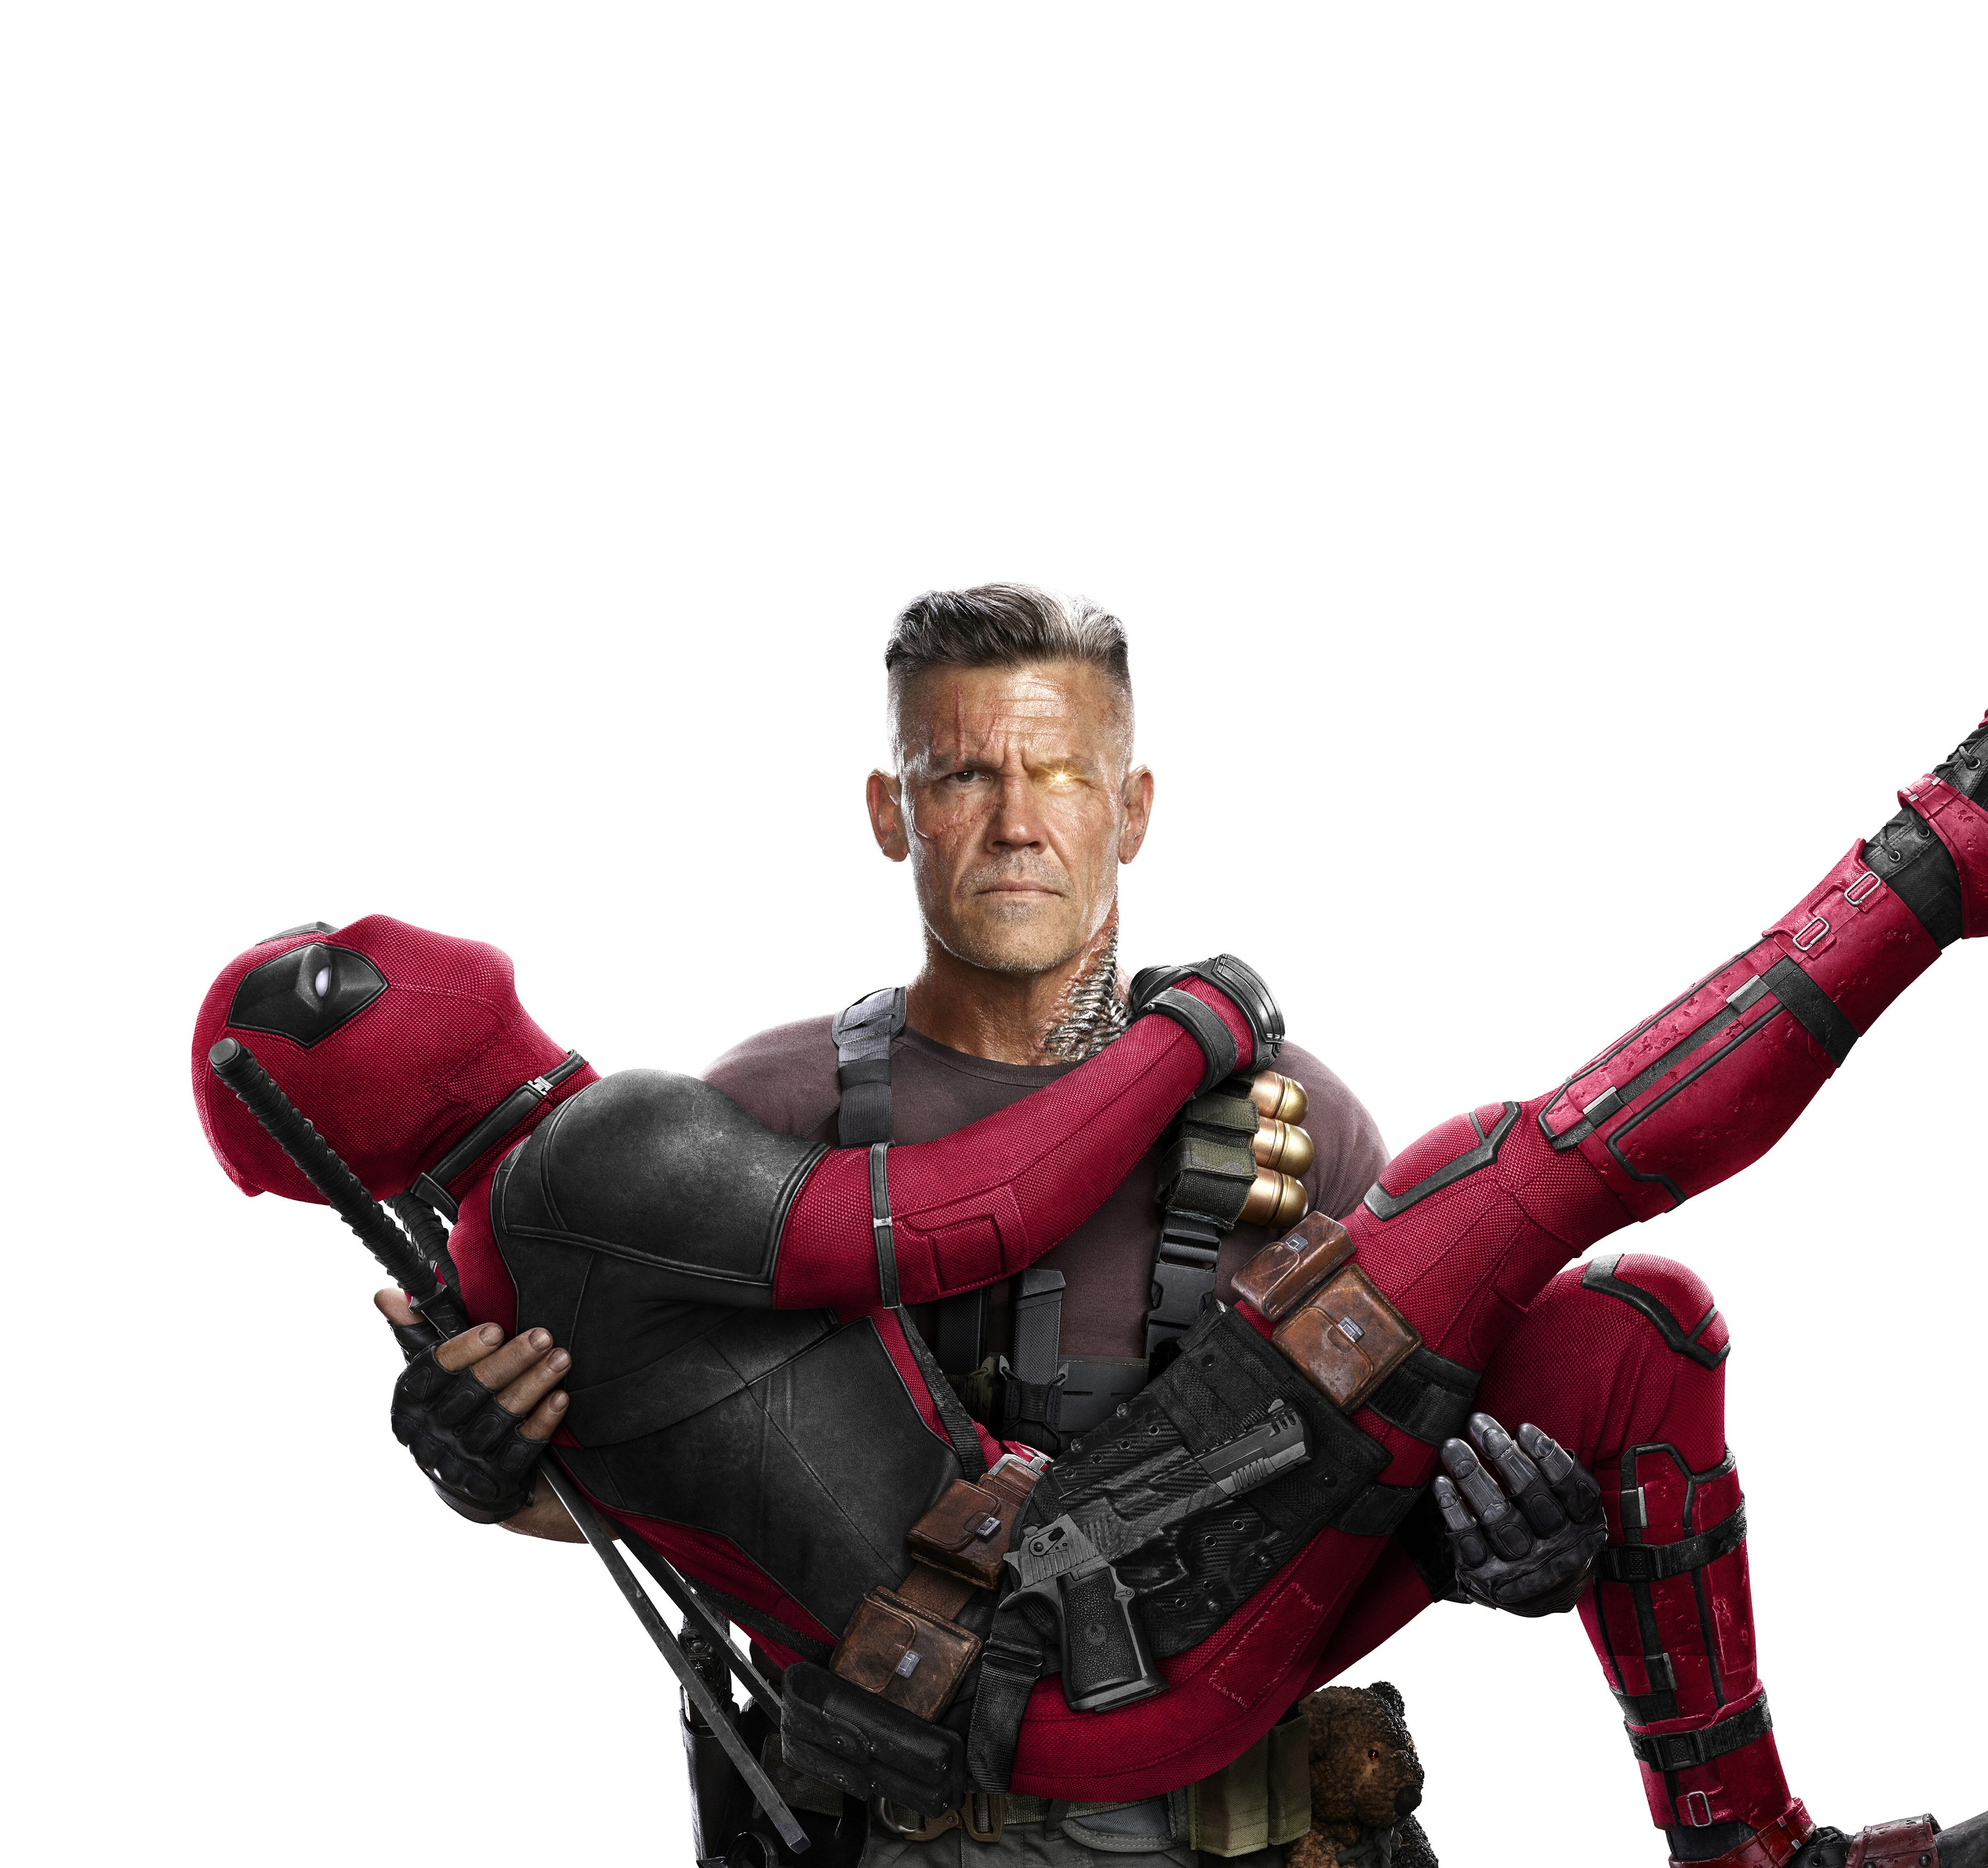 Top Wallpaper Movie Deadpool - deadpool-2-deadpool-cable-movie-5k-wallpaper-3415x3209  Snapshot_201210.jpg